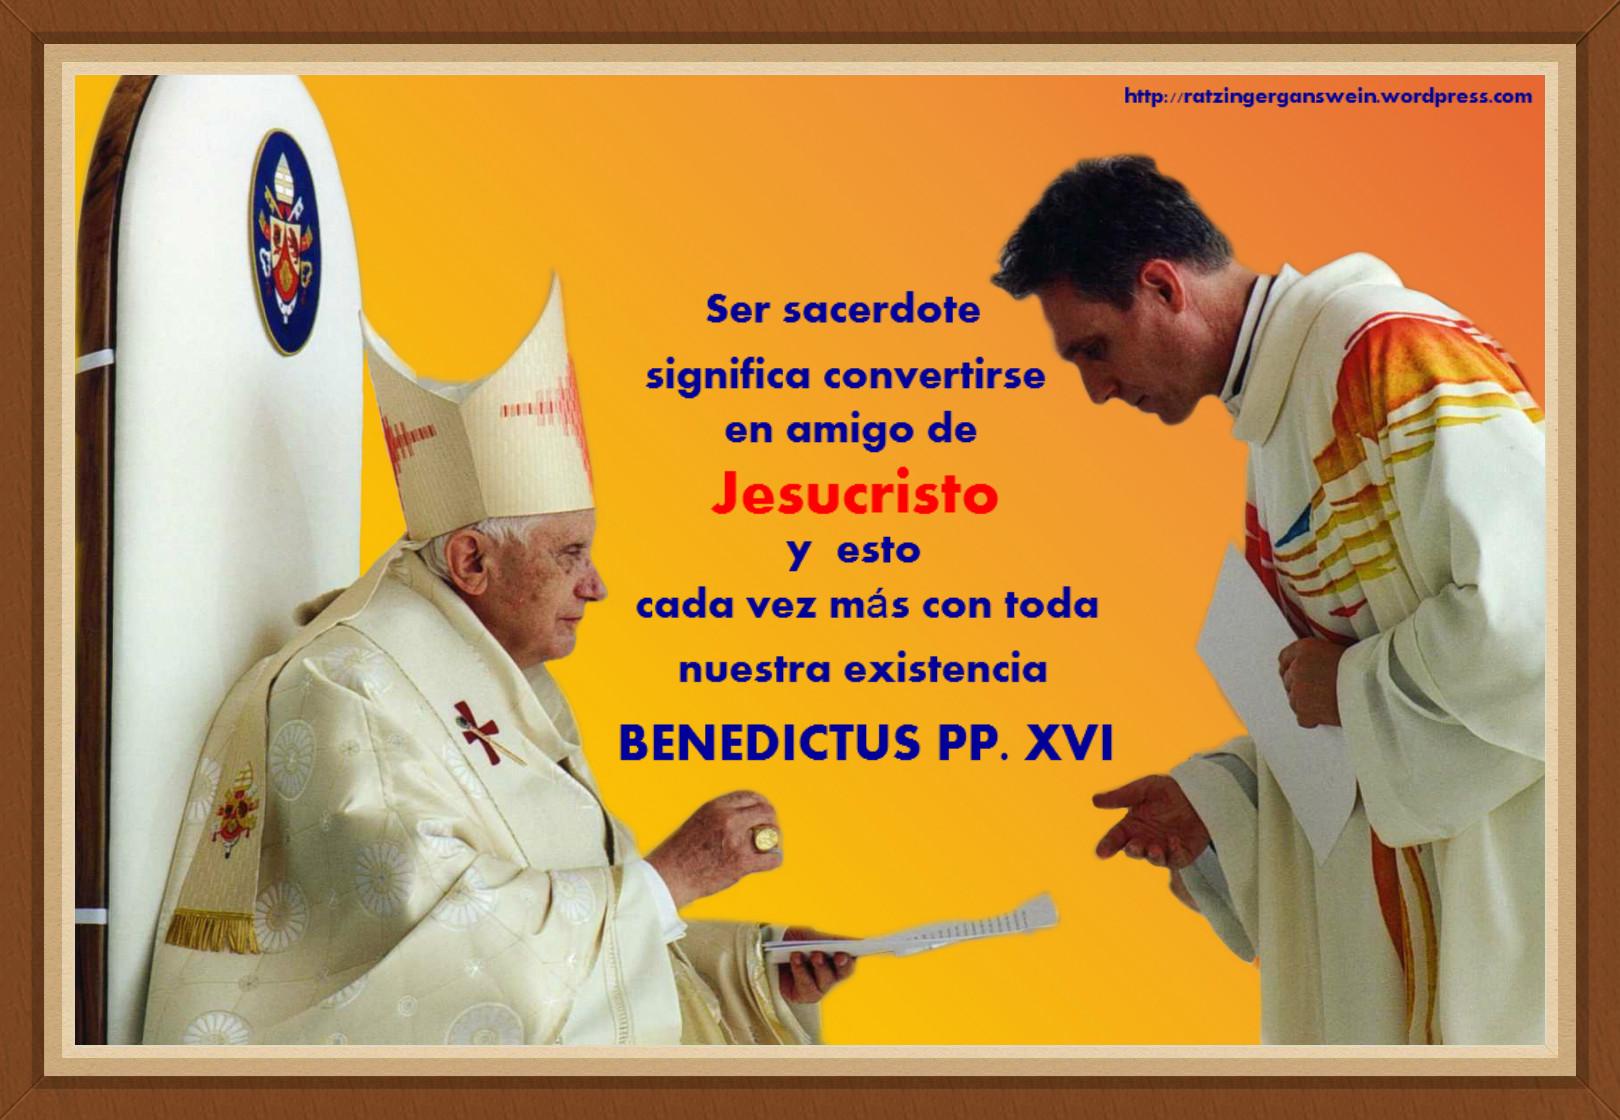 Watch further Elsalvadorenelsigloxx Anibalkathy2011 blogspot also 11349 11349 additionally 127515 further 4979 Presidente Beato Romero Impulsa Esfuerzos Para Construir Bienestar Y Felicidad R Pasar A Nacional. on arzobispo oscar romero